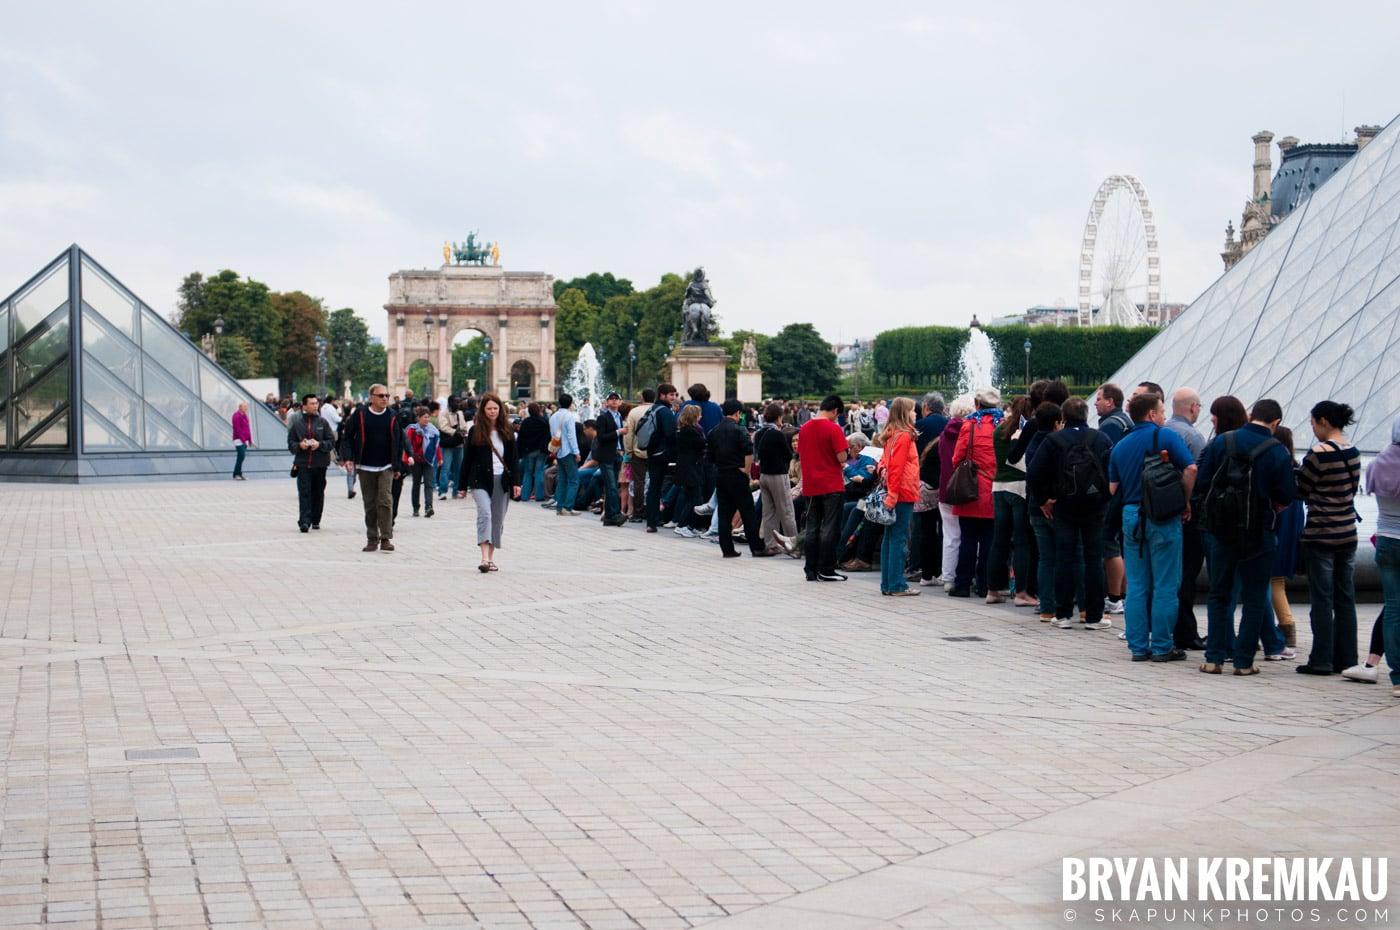 Paris, France Honeymoon - Day 3 - 7.20.11 (104)